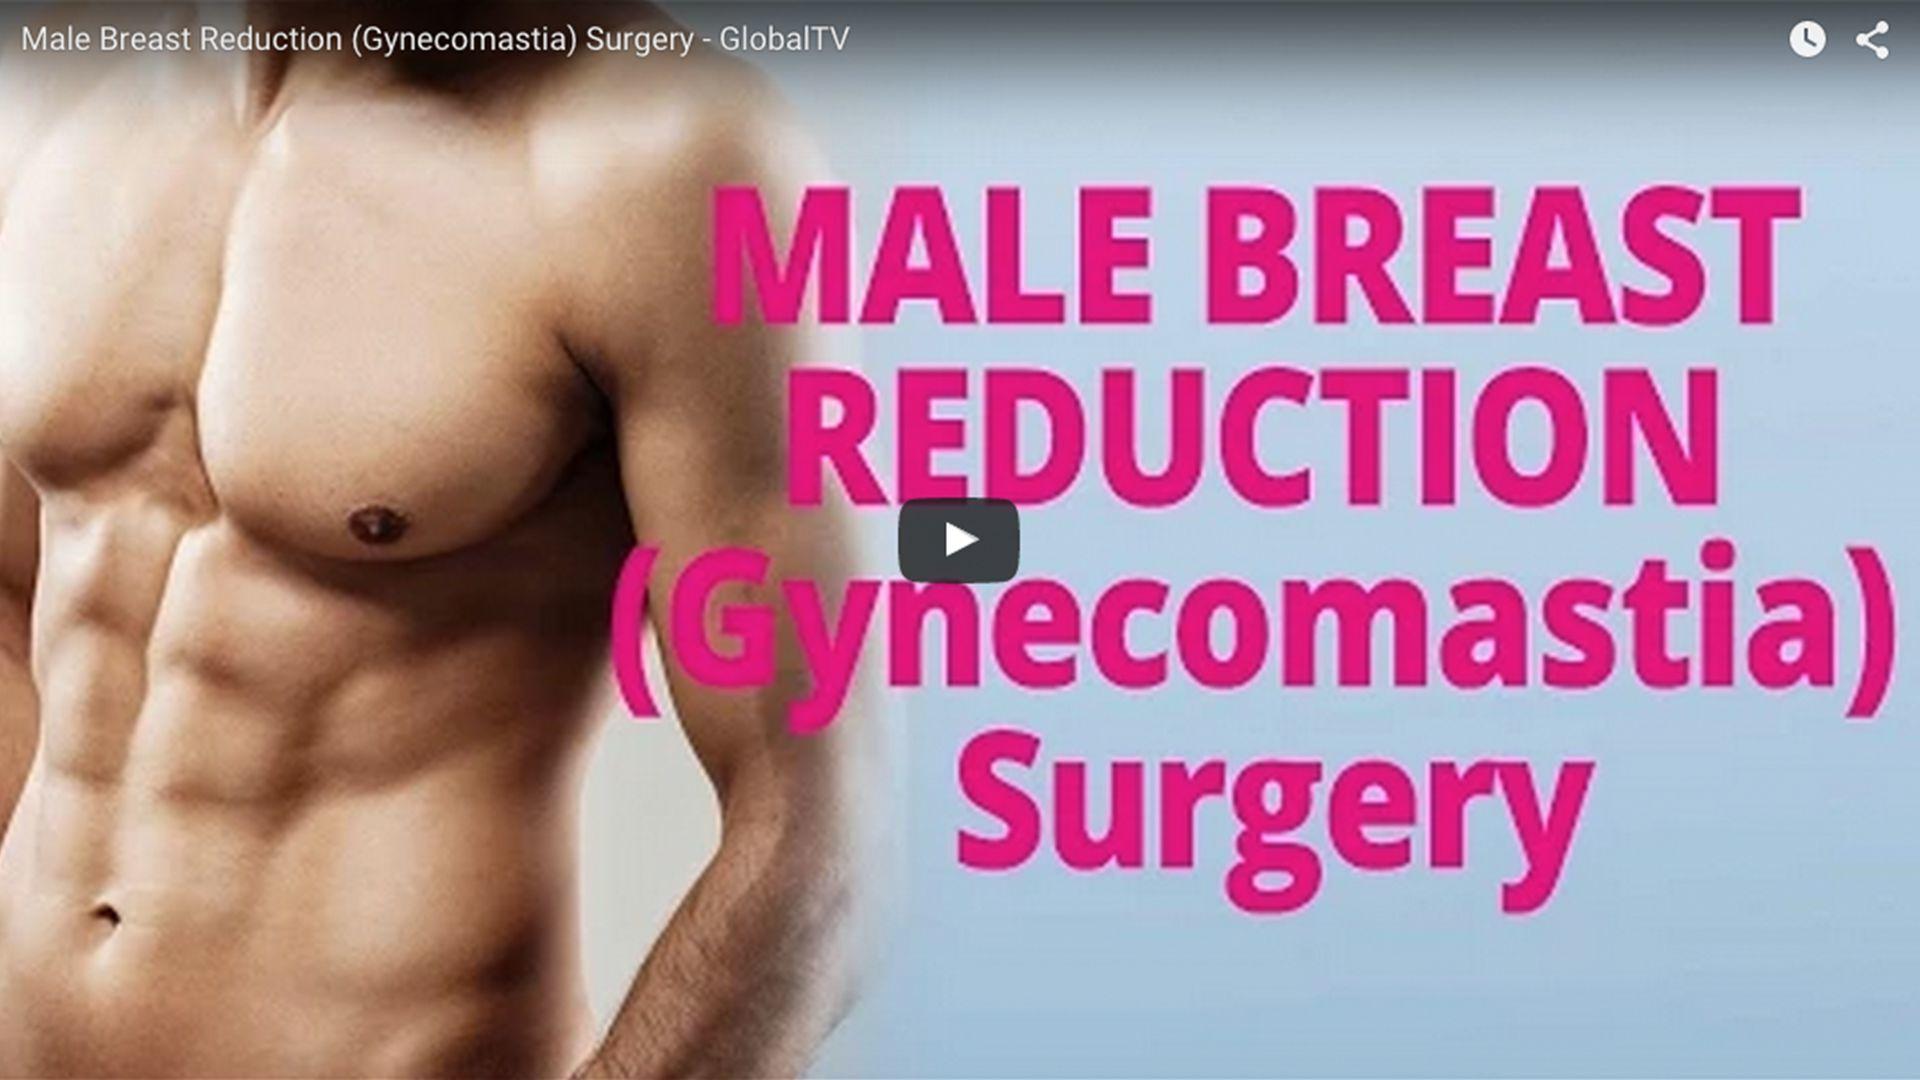 Male Breast Reduction (Gynecomastia) Surgery - GlobalTV